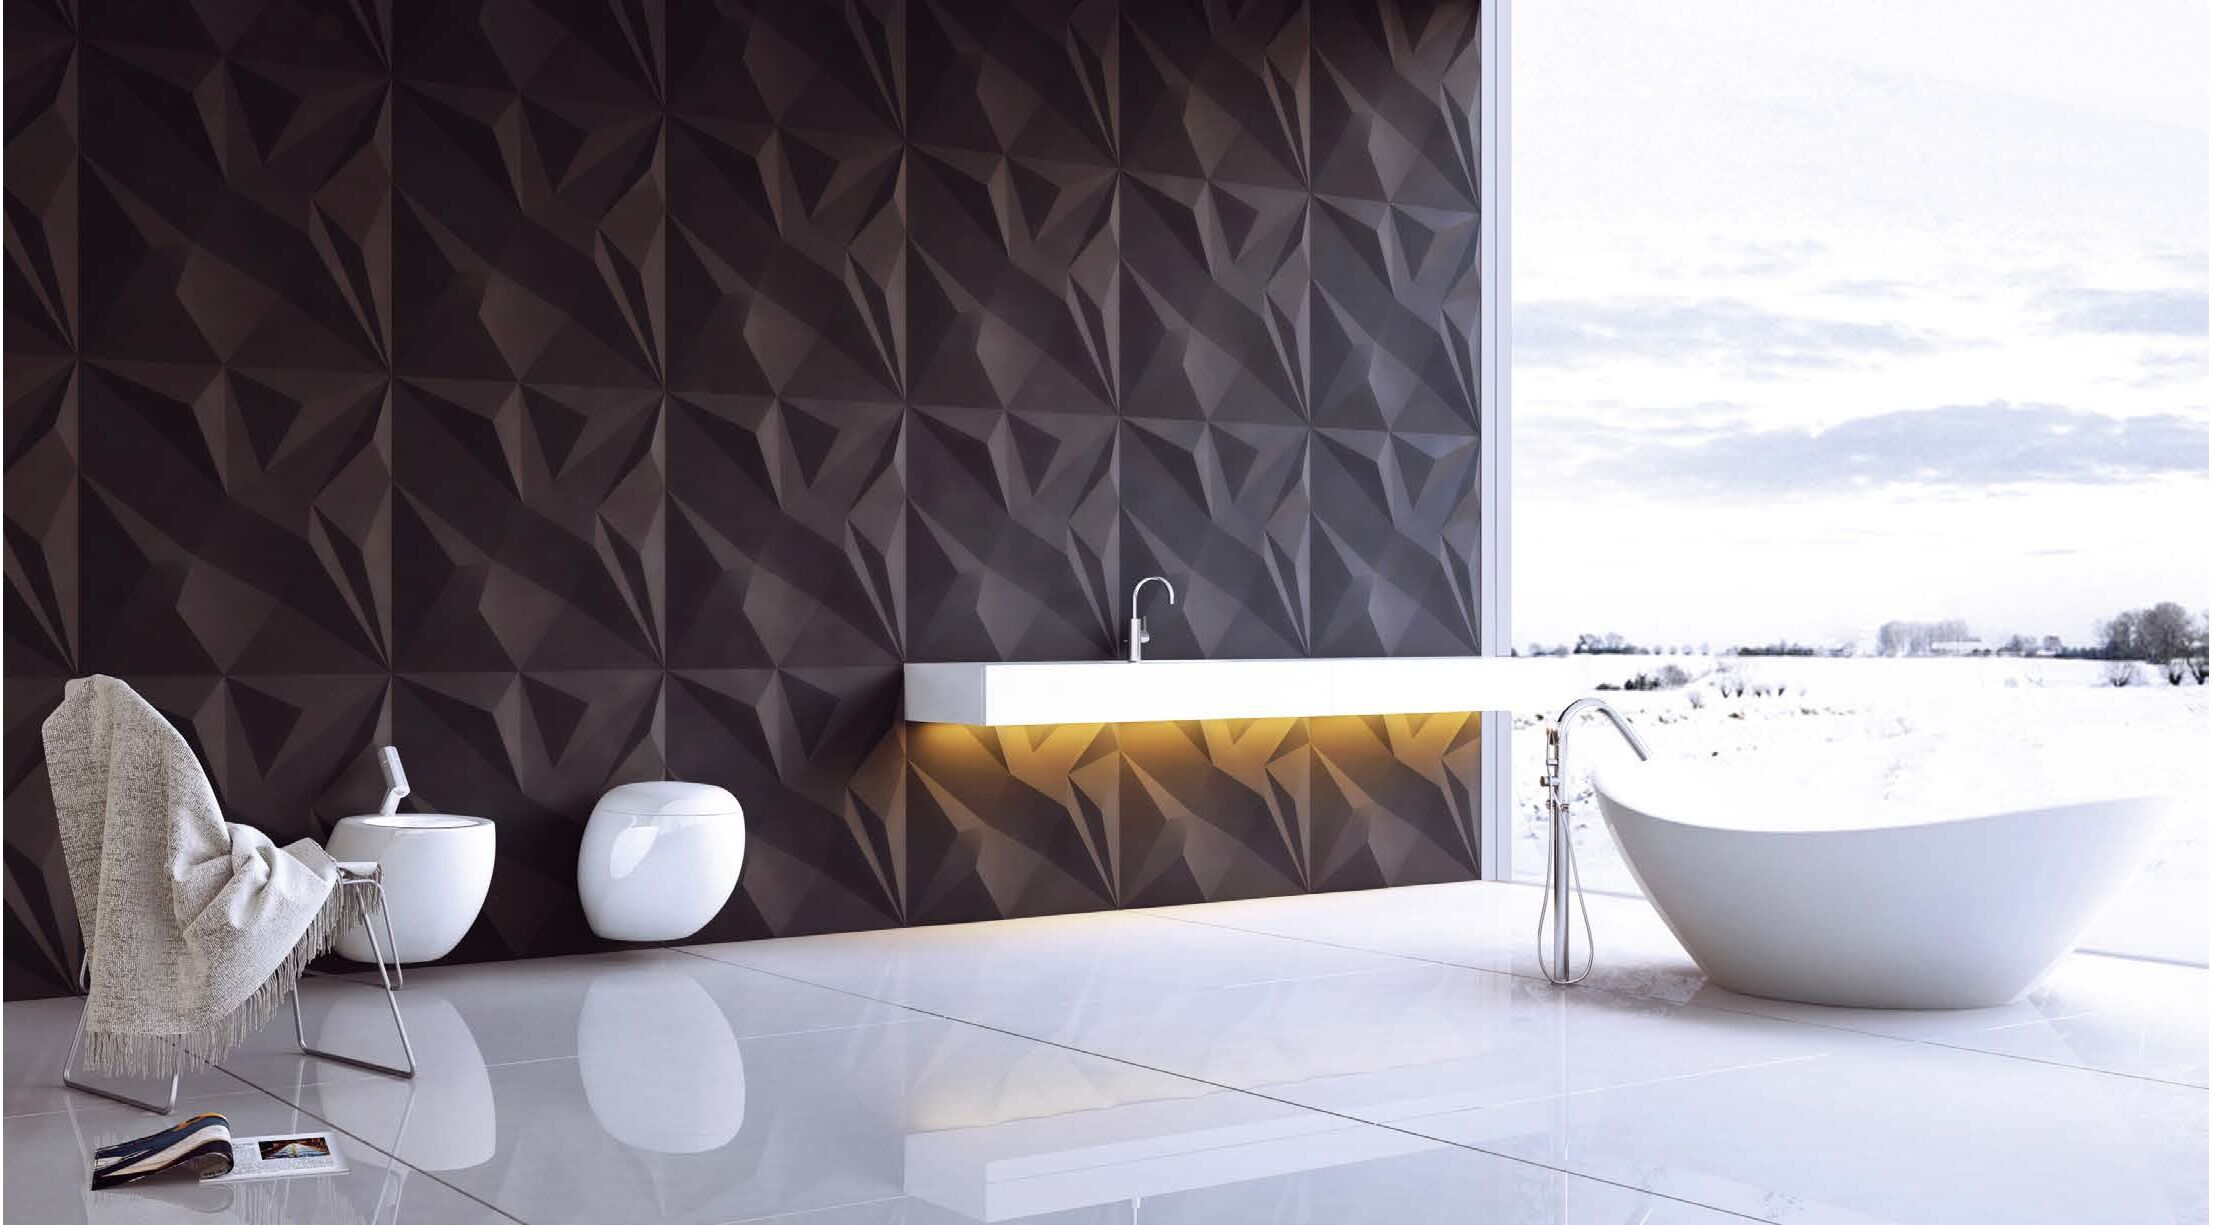 3d wandpaneele denali jetzt ansehen. Black Bedroom Furniture Sets. Home Design Ideas